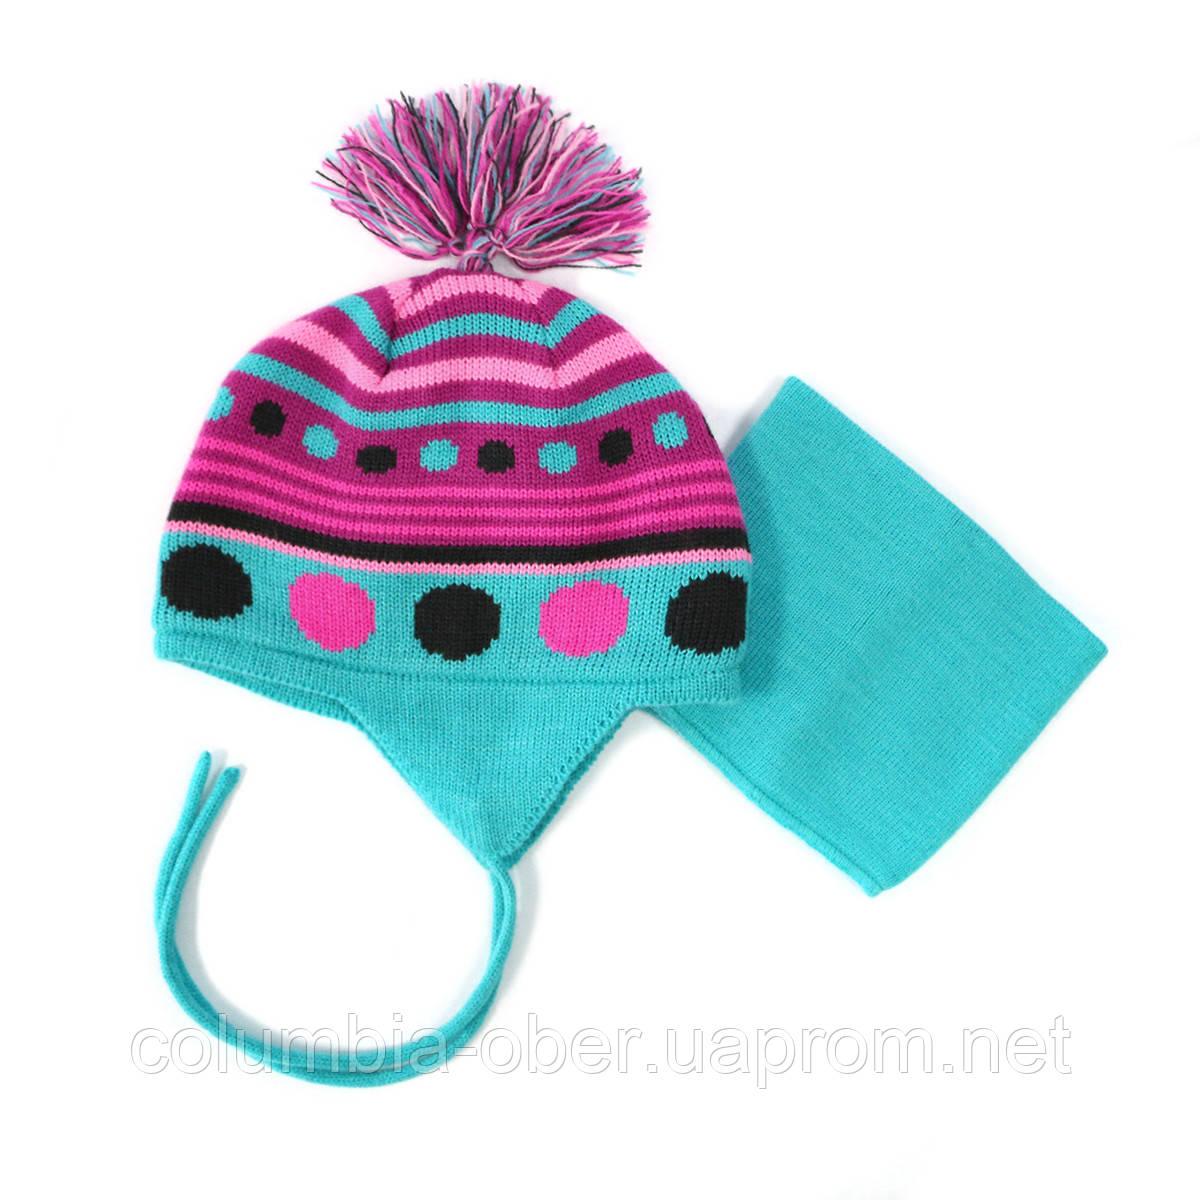 Зимняя шапка+манишка для девочки PELUCHE 32 BF ACC F16 Aquablue. Размер 12/24м и 2/3.